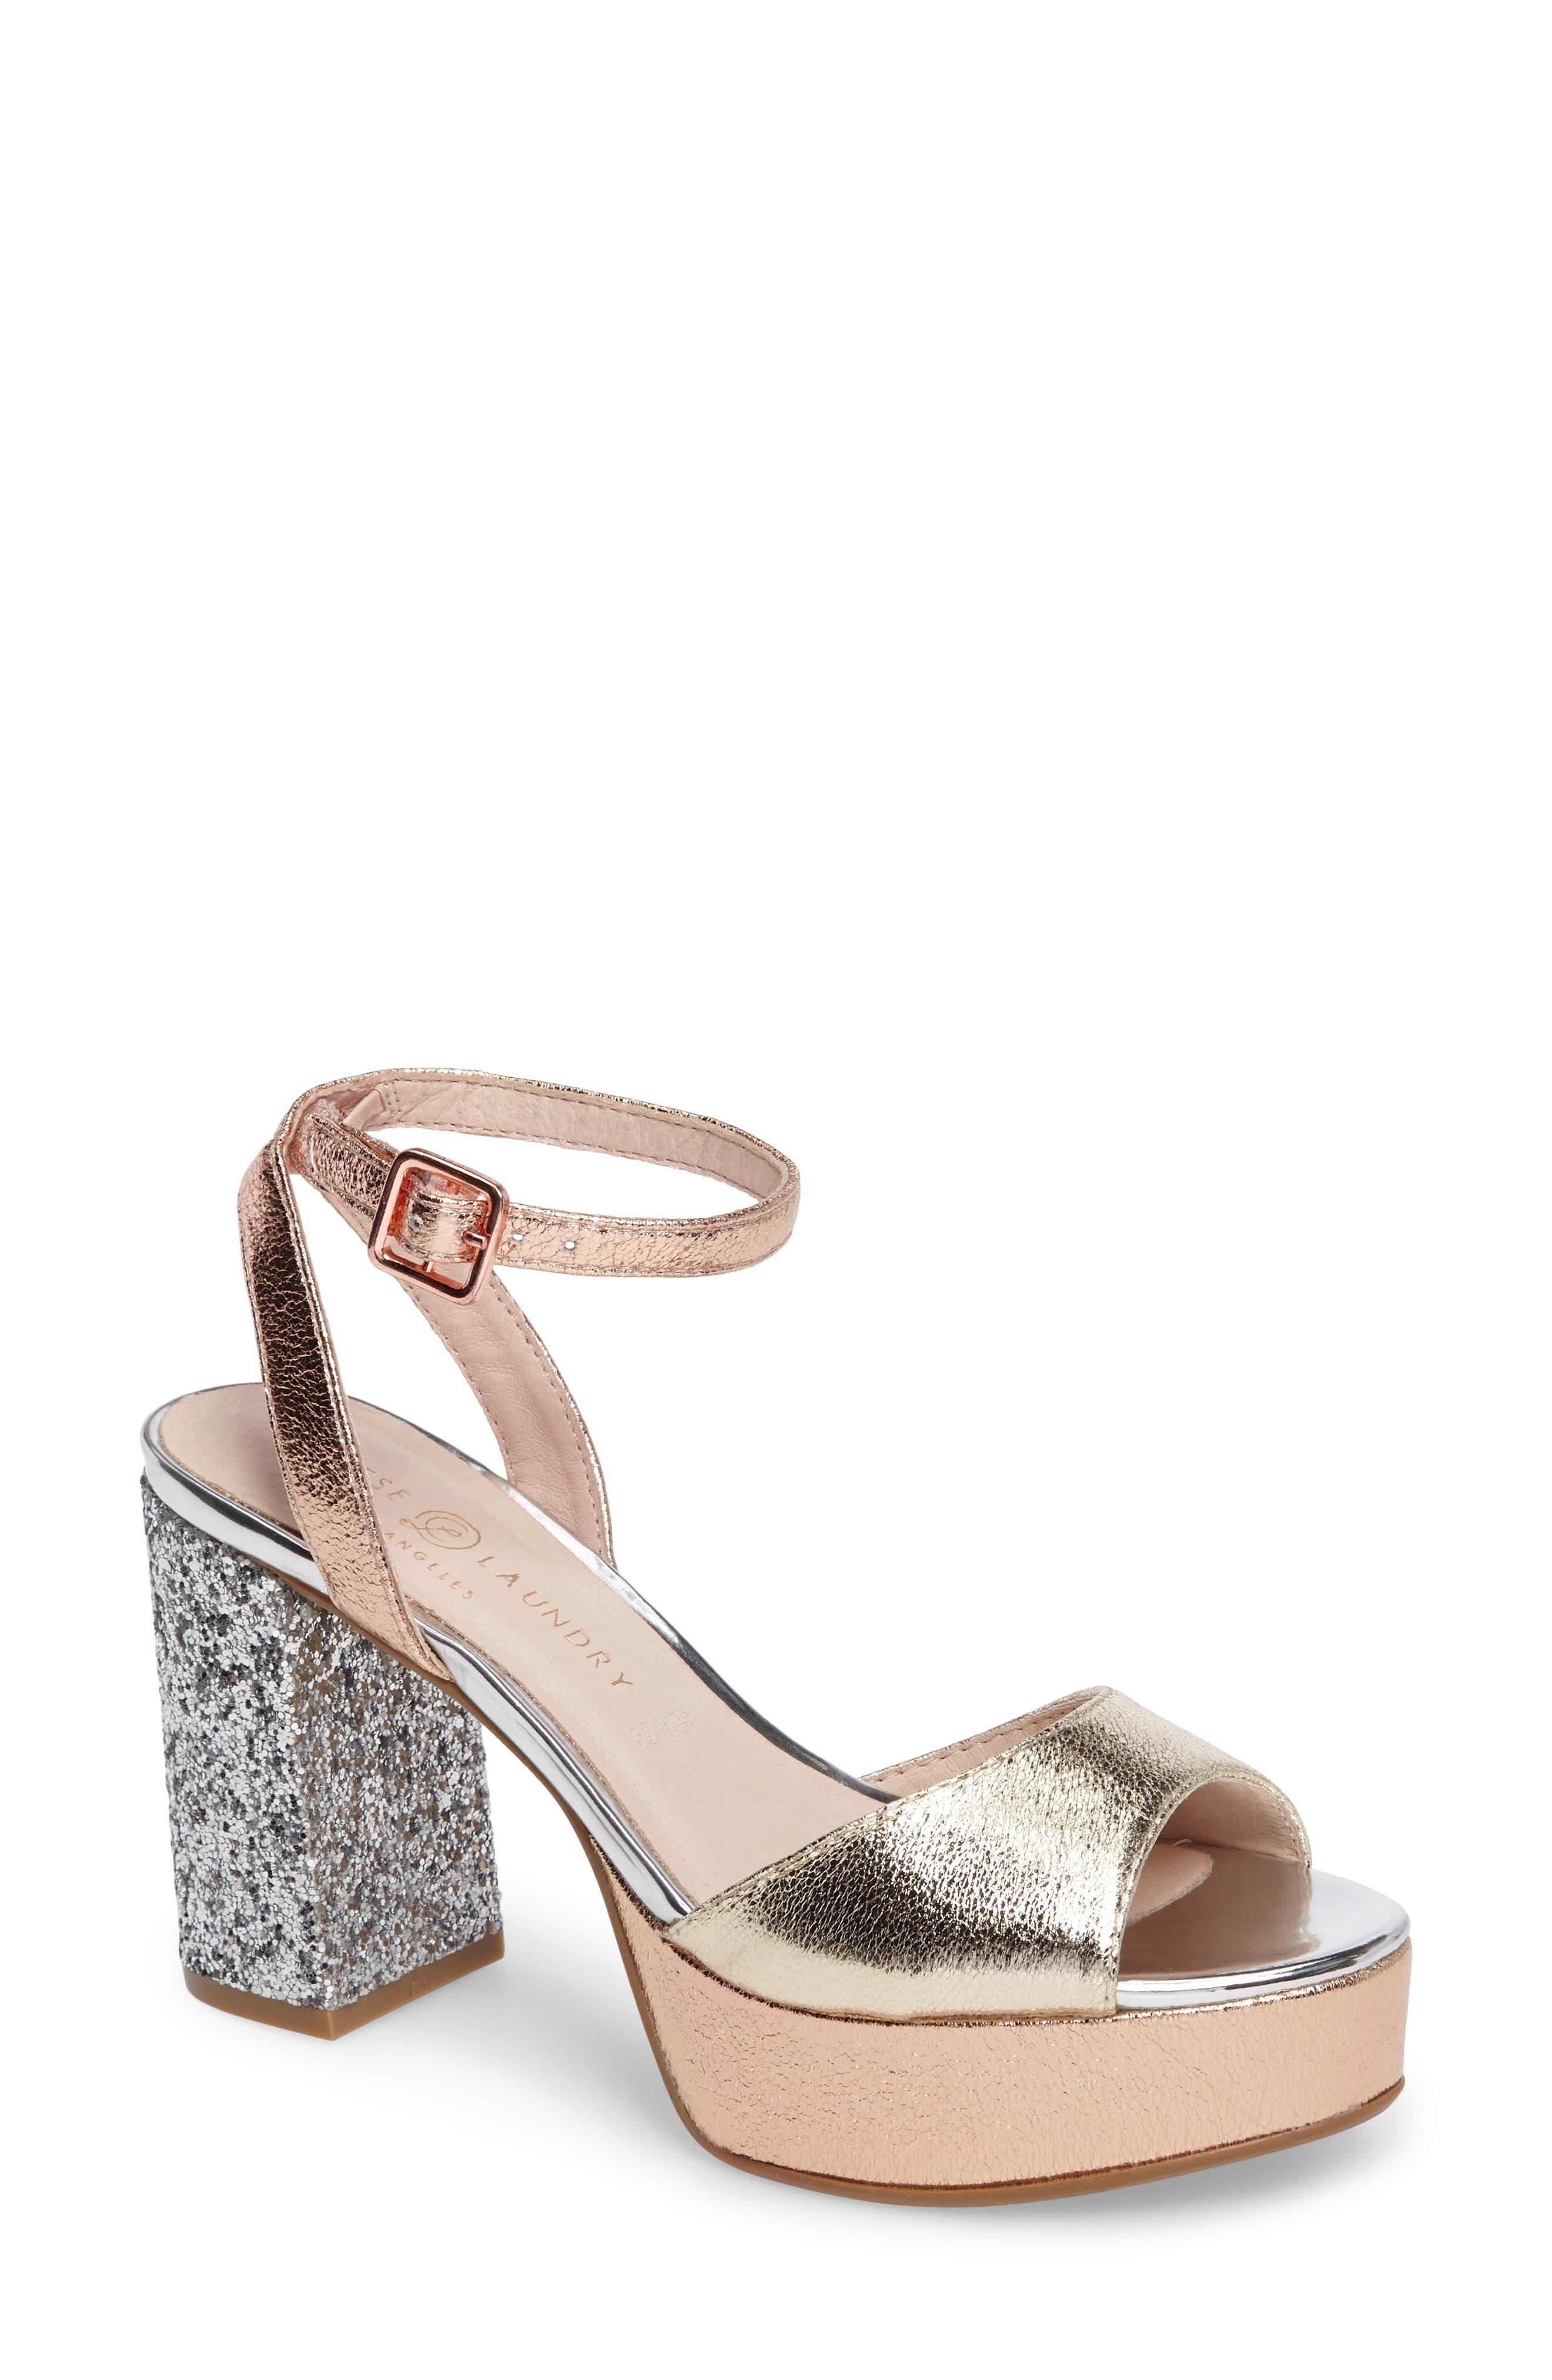 Main Image - Chinese Laundry Tayla Platform Sandal (Women)